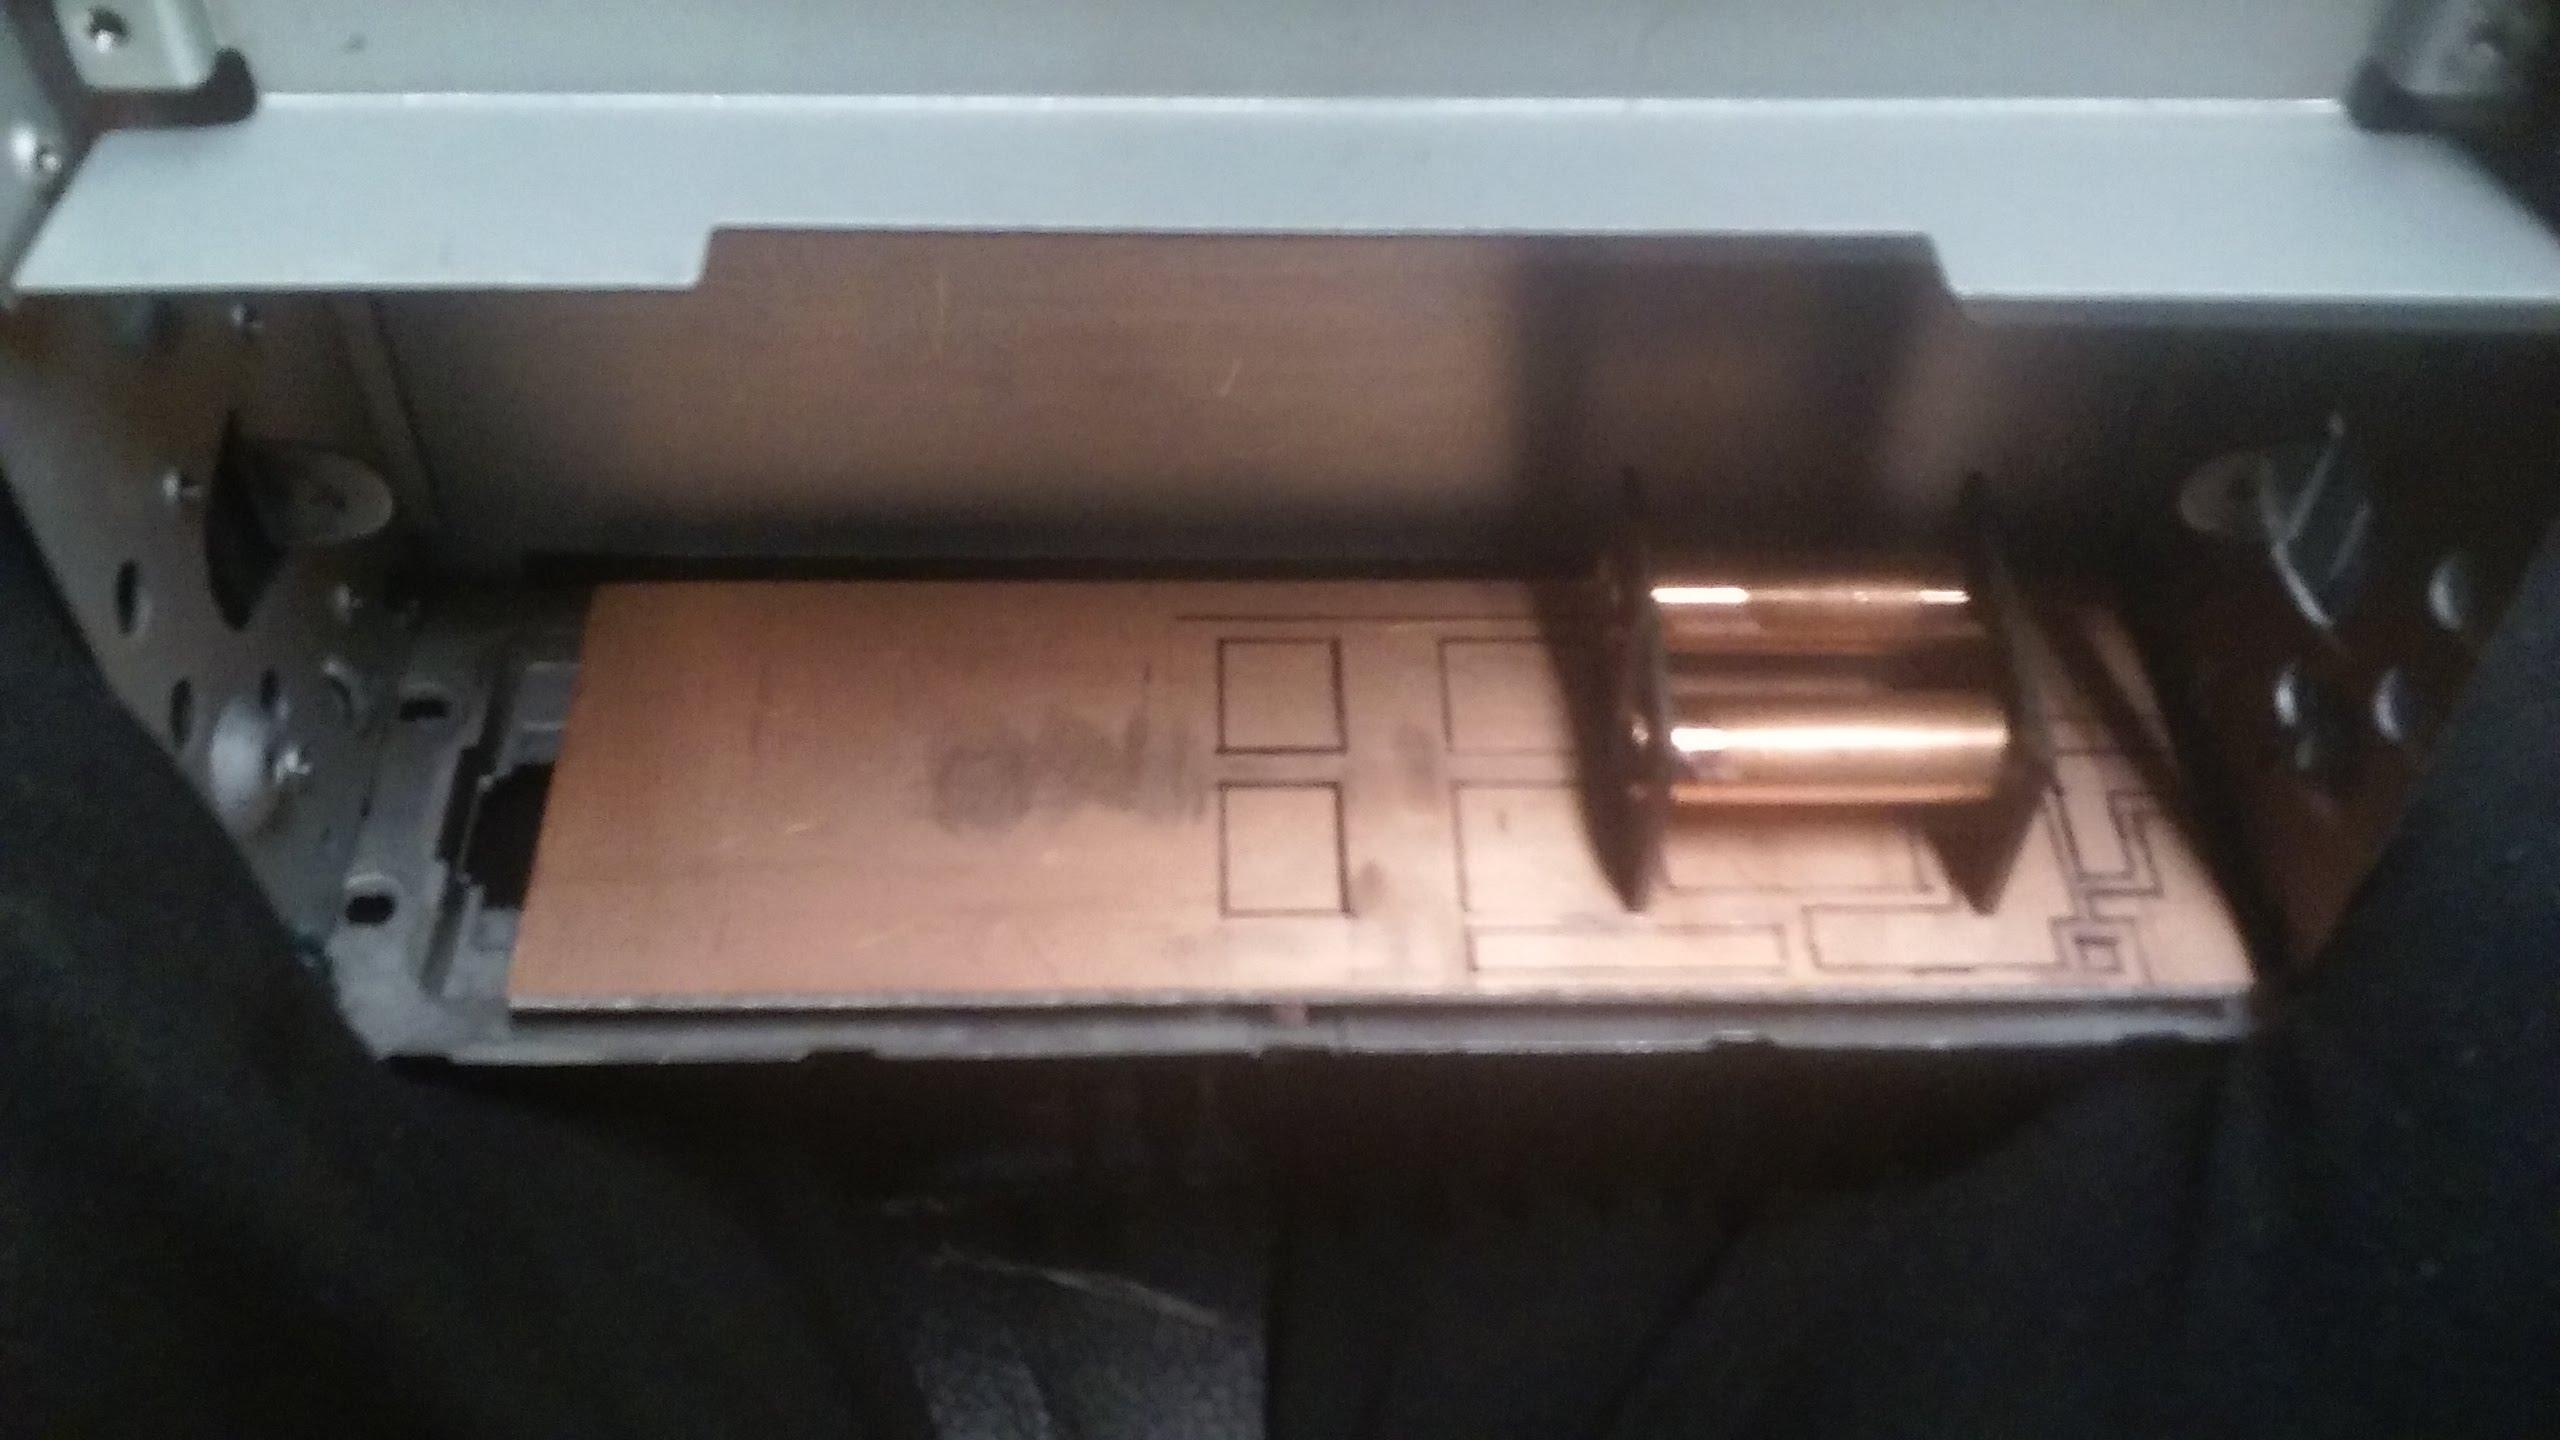 amp_board_chassis.jpeg